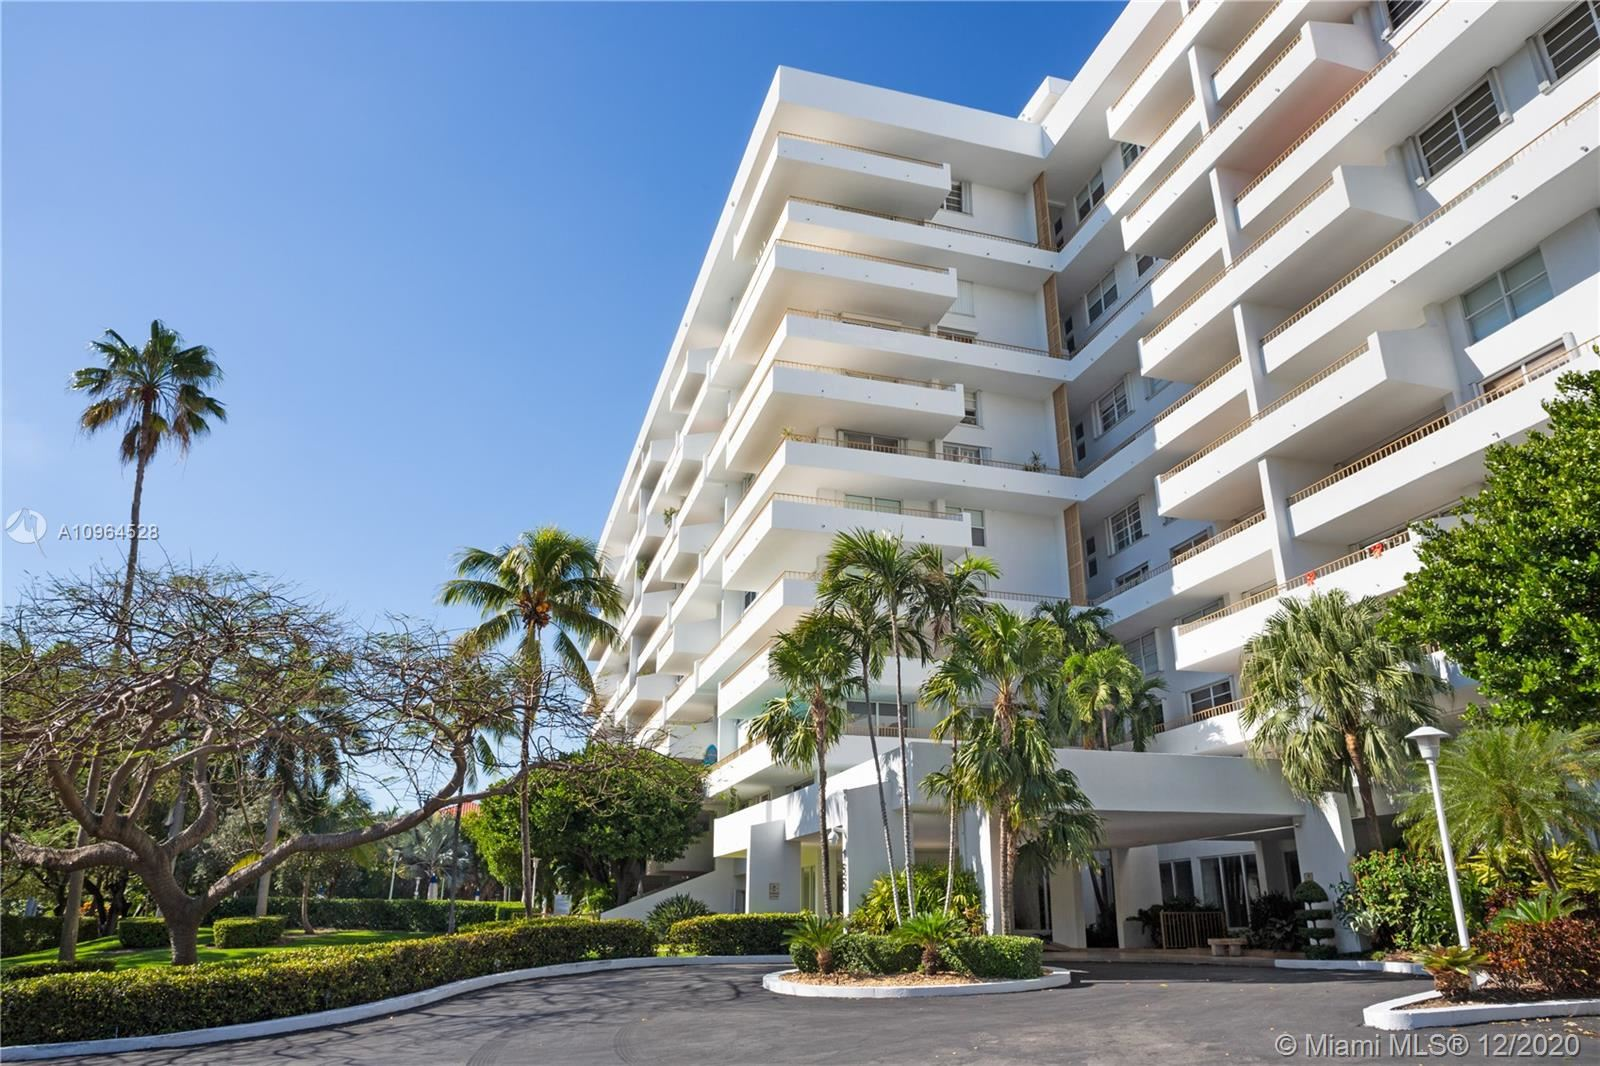 155 Ocean Lane Dr #210, Key Biscayne, FL 33149 - #: A10964528